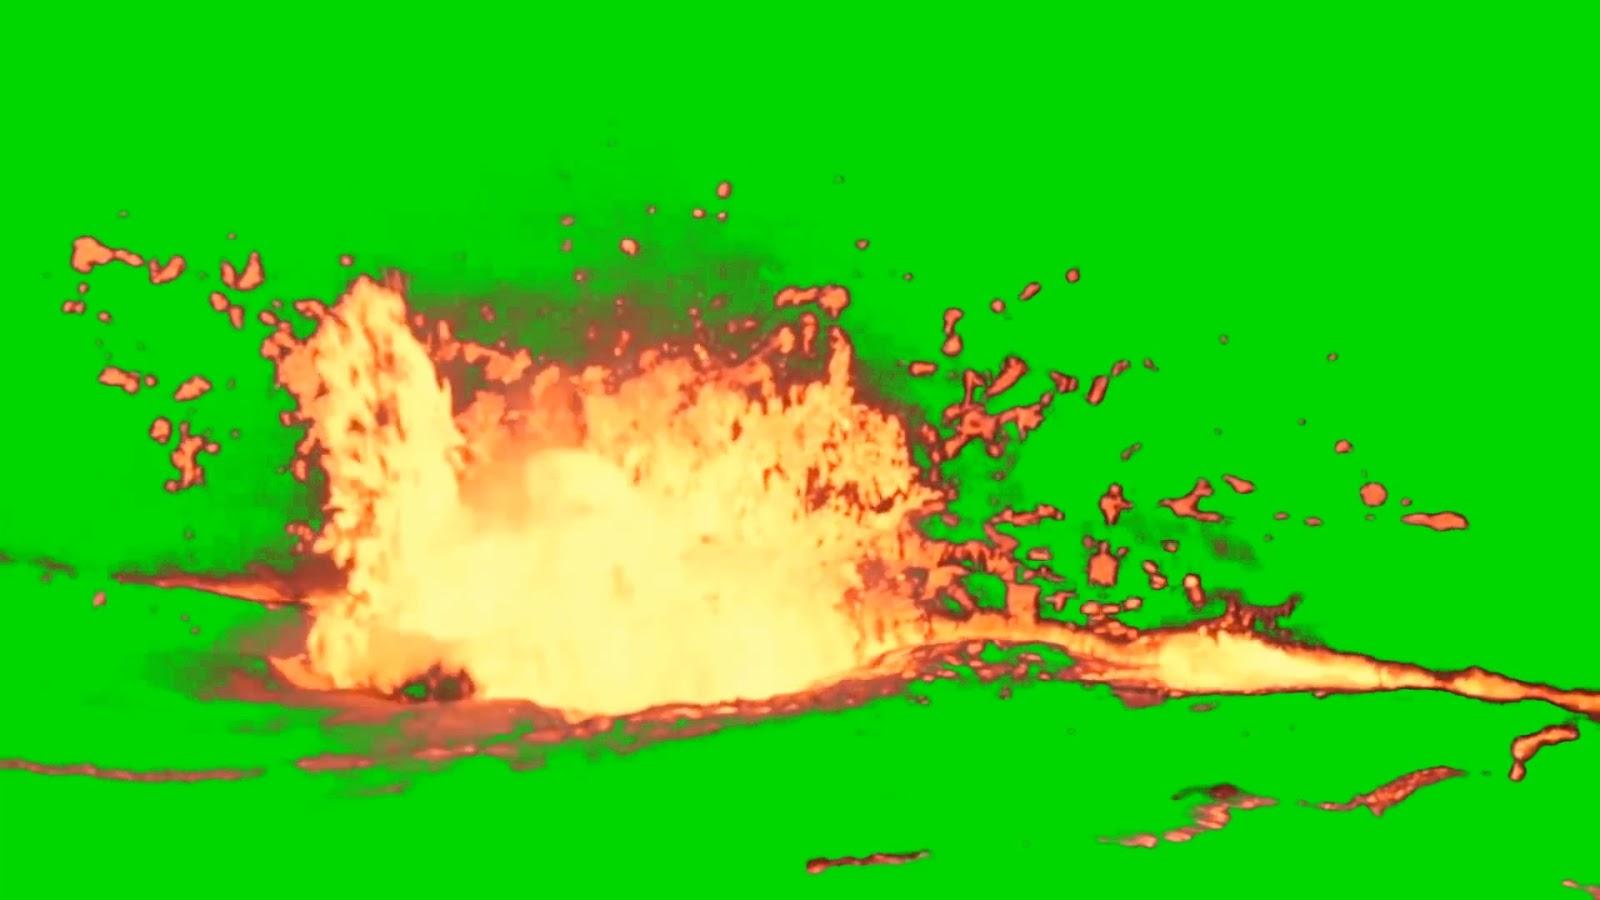 Vidiots Channel Free Video Project    Free Green Screen Videos  U0026 More  Fire  U0026 Smoke Effects